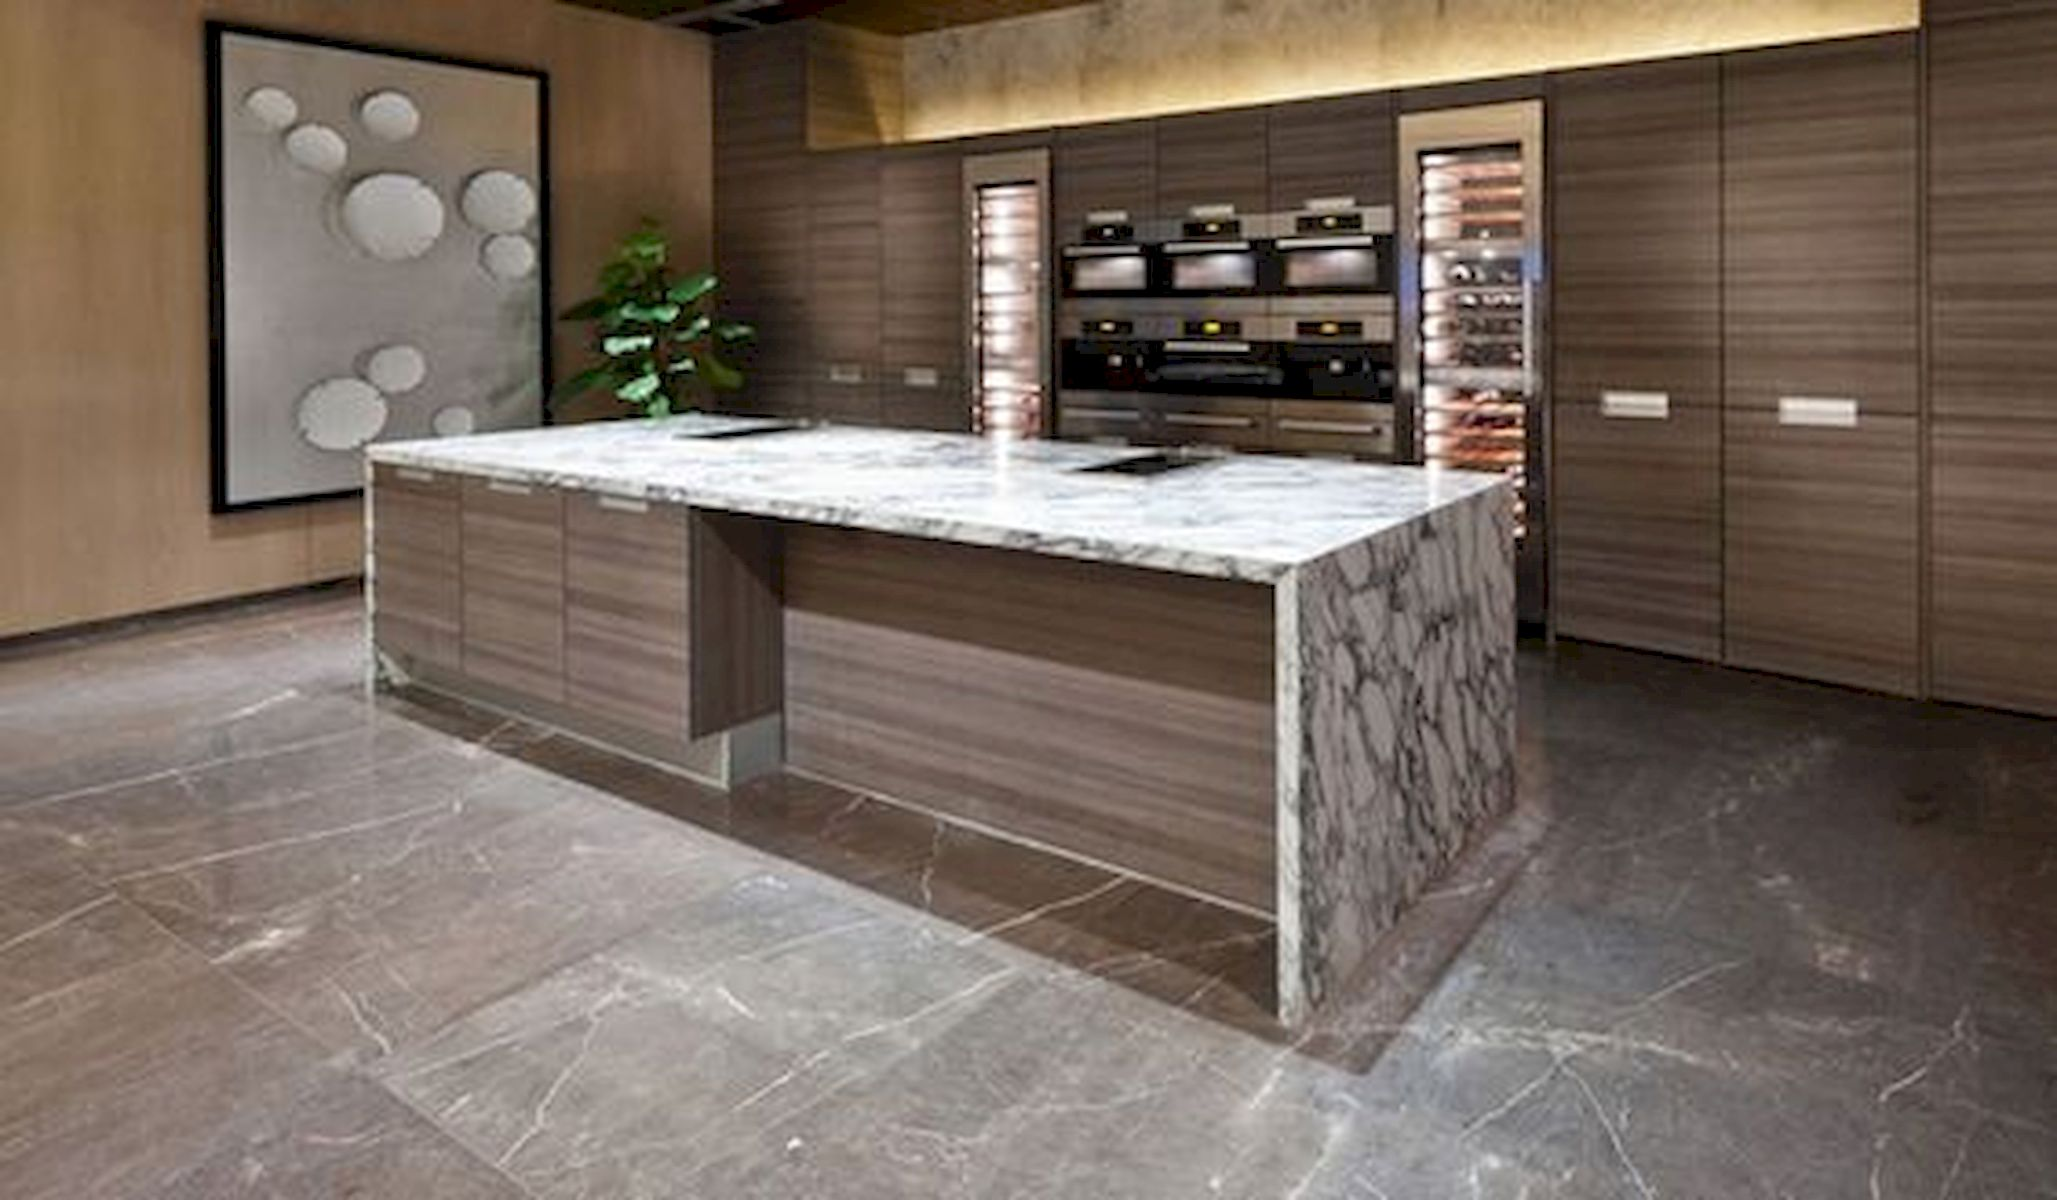 30 Best Kitchen Floor Tile Design Ideas With Concrete Floor Ideas (5)